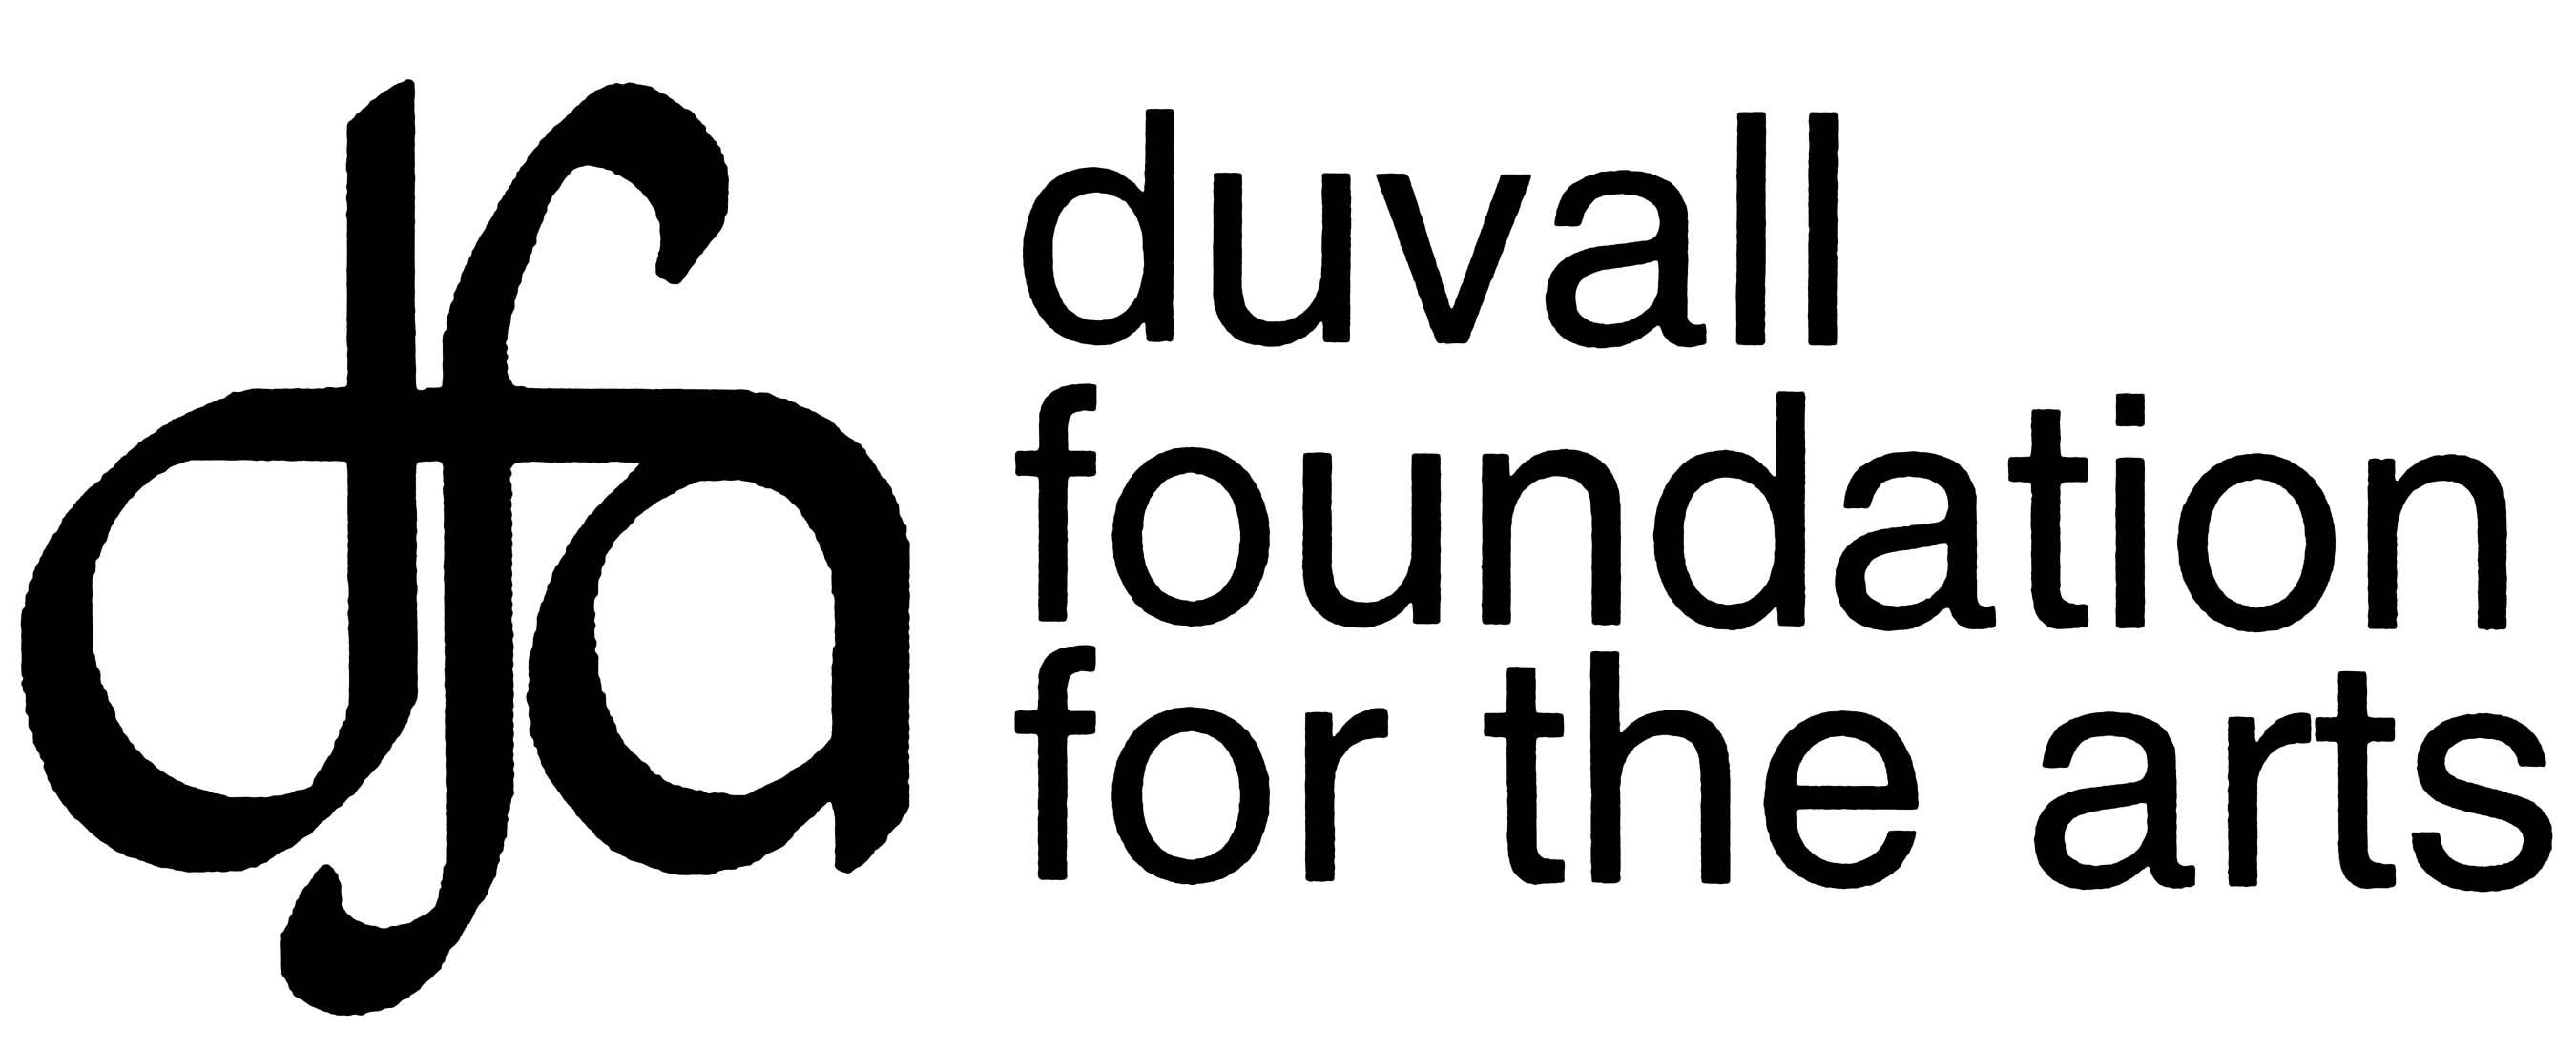 http://nwacmockup.com/wp-content/uploads/2014/08/DFA-large-logo.jpg